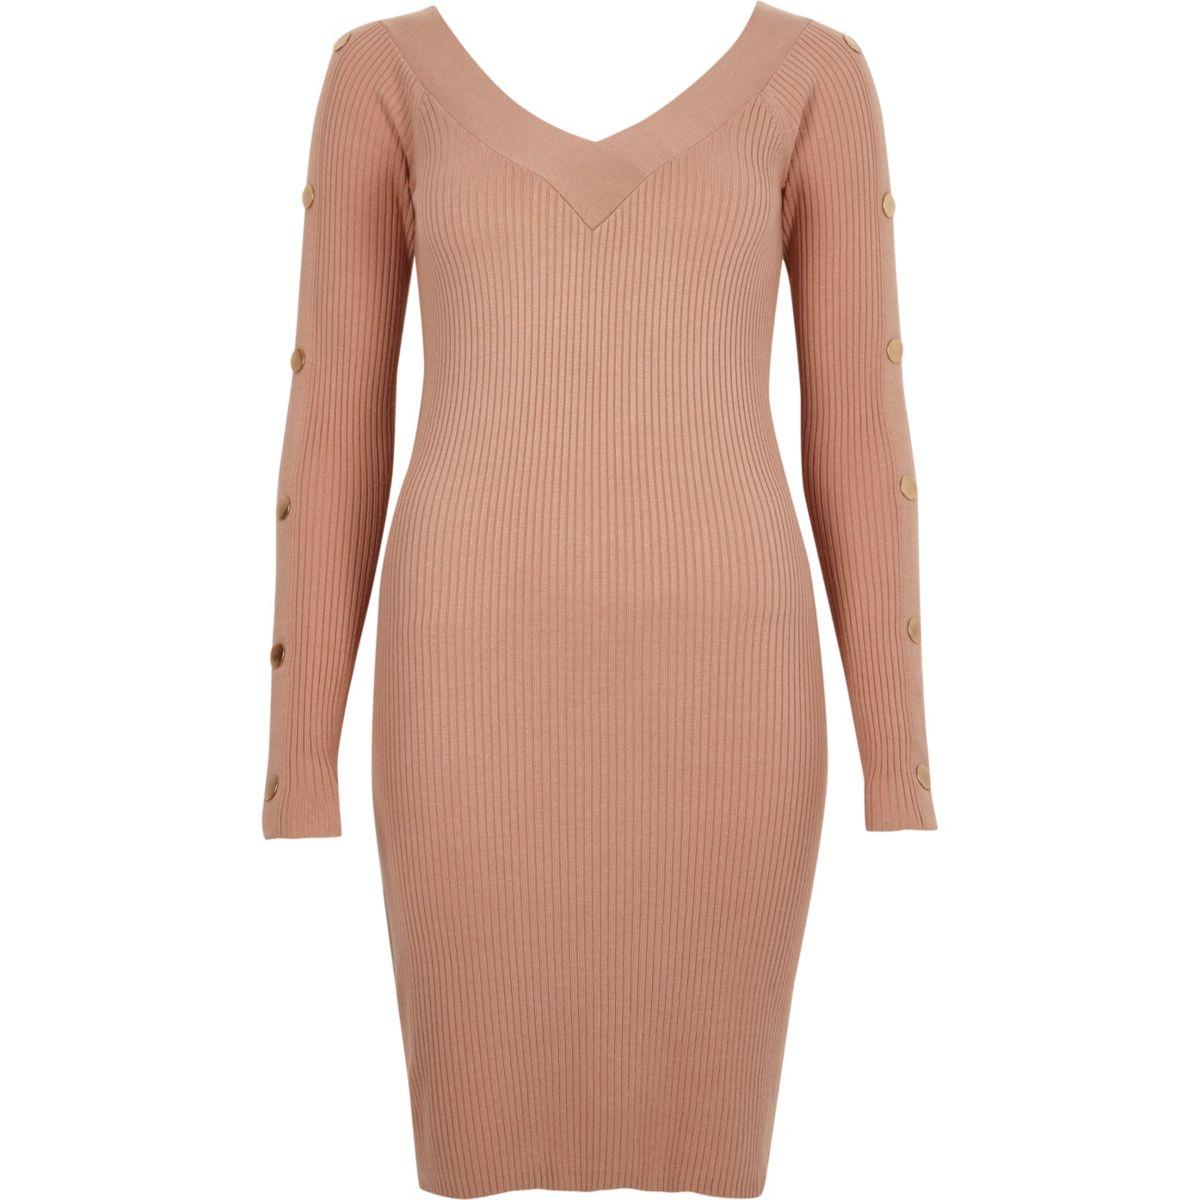 Light pink rib knit long sleeve bodycon dress